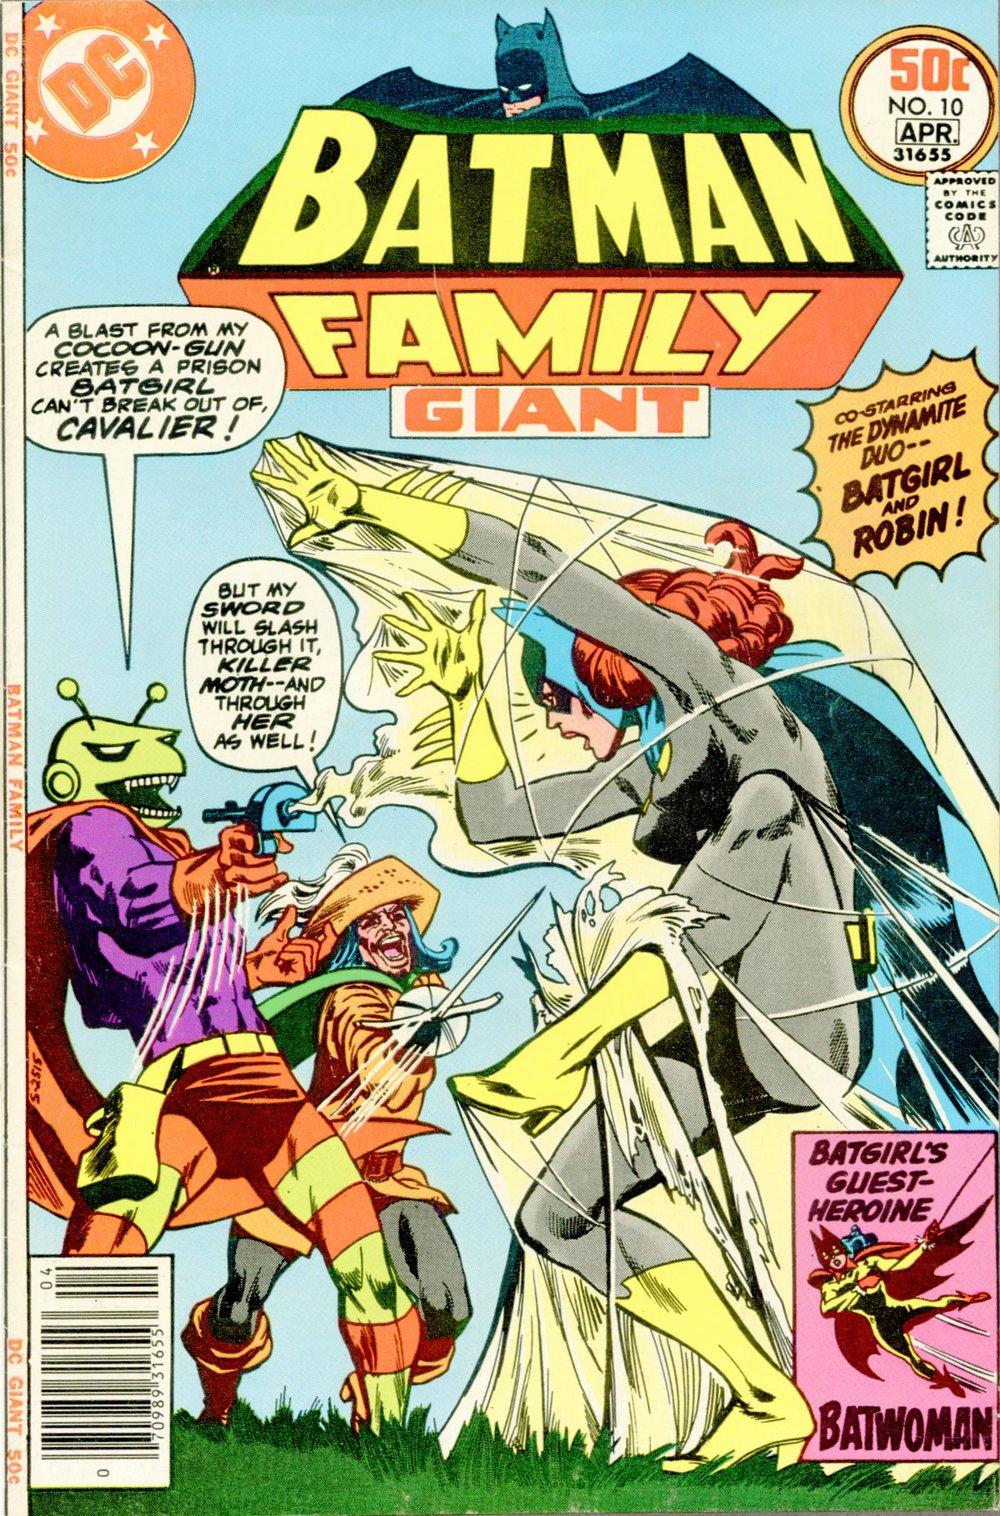 Batman Family (1975) #10, cover penciled by Bob Brown & inked by John Calnan.